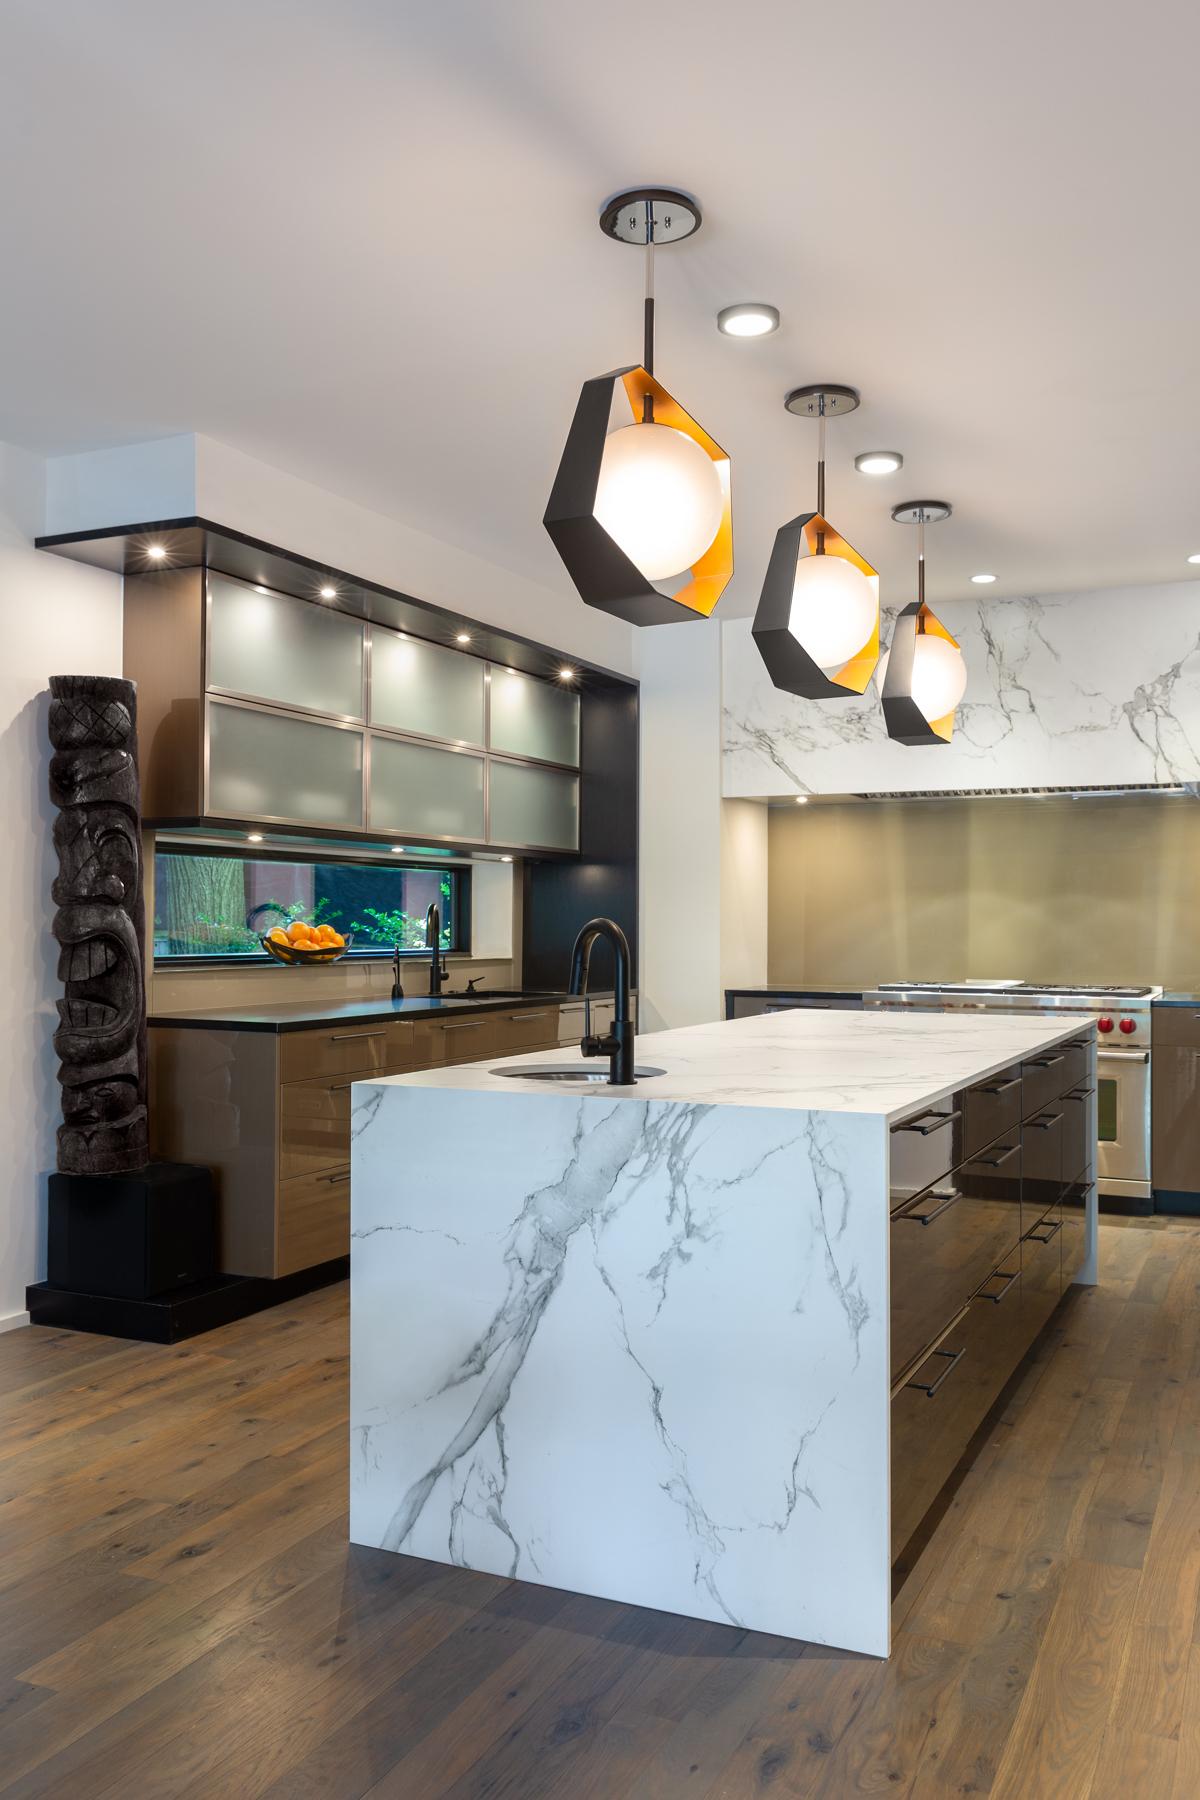 sq-kitchen-4.jpg